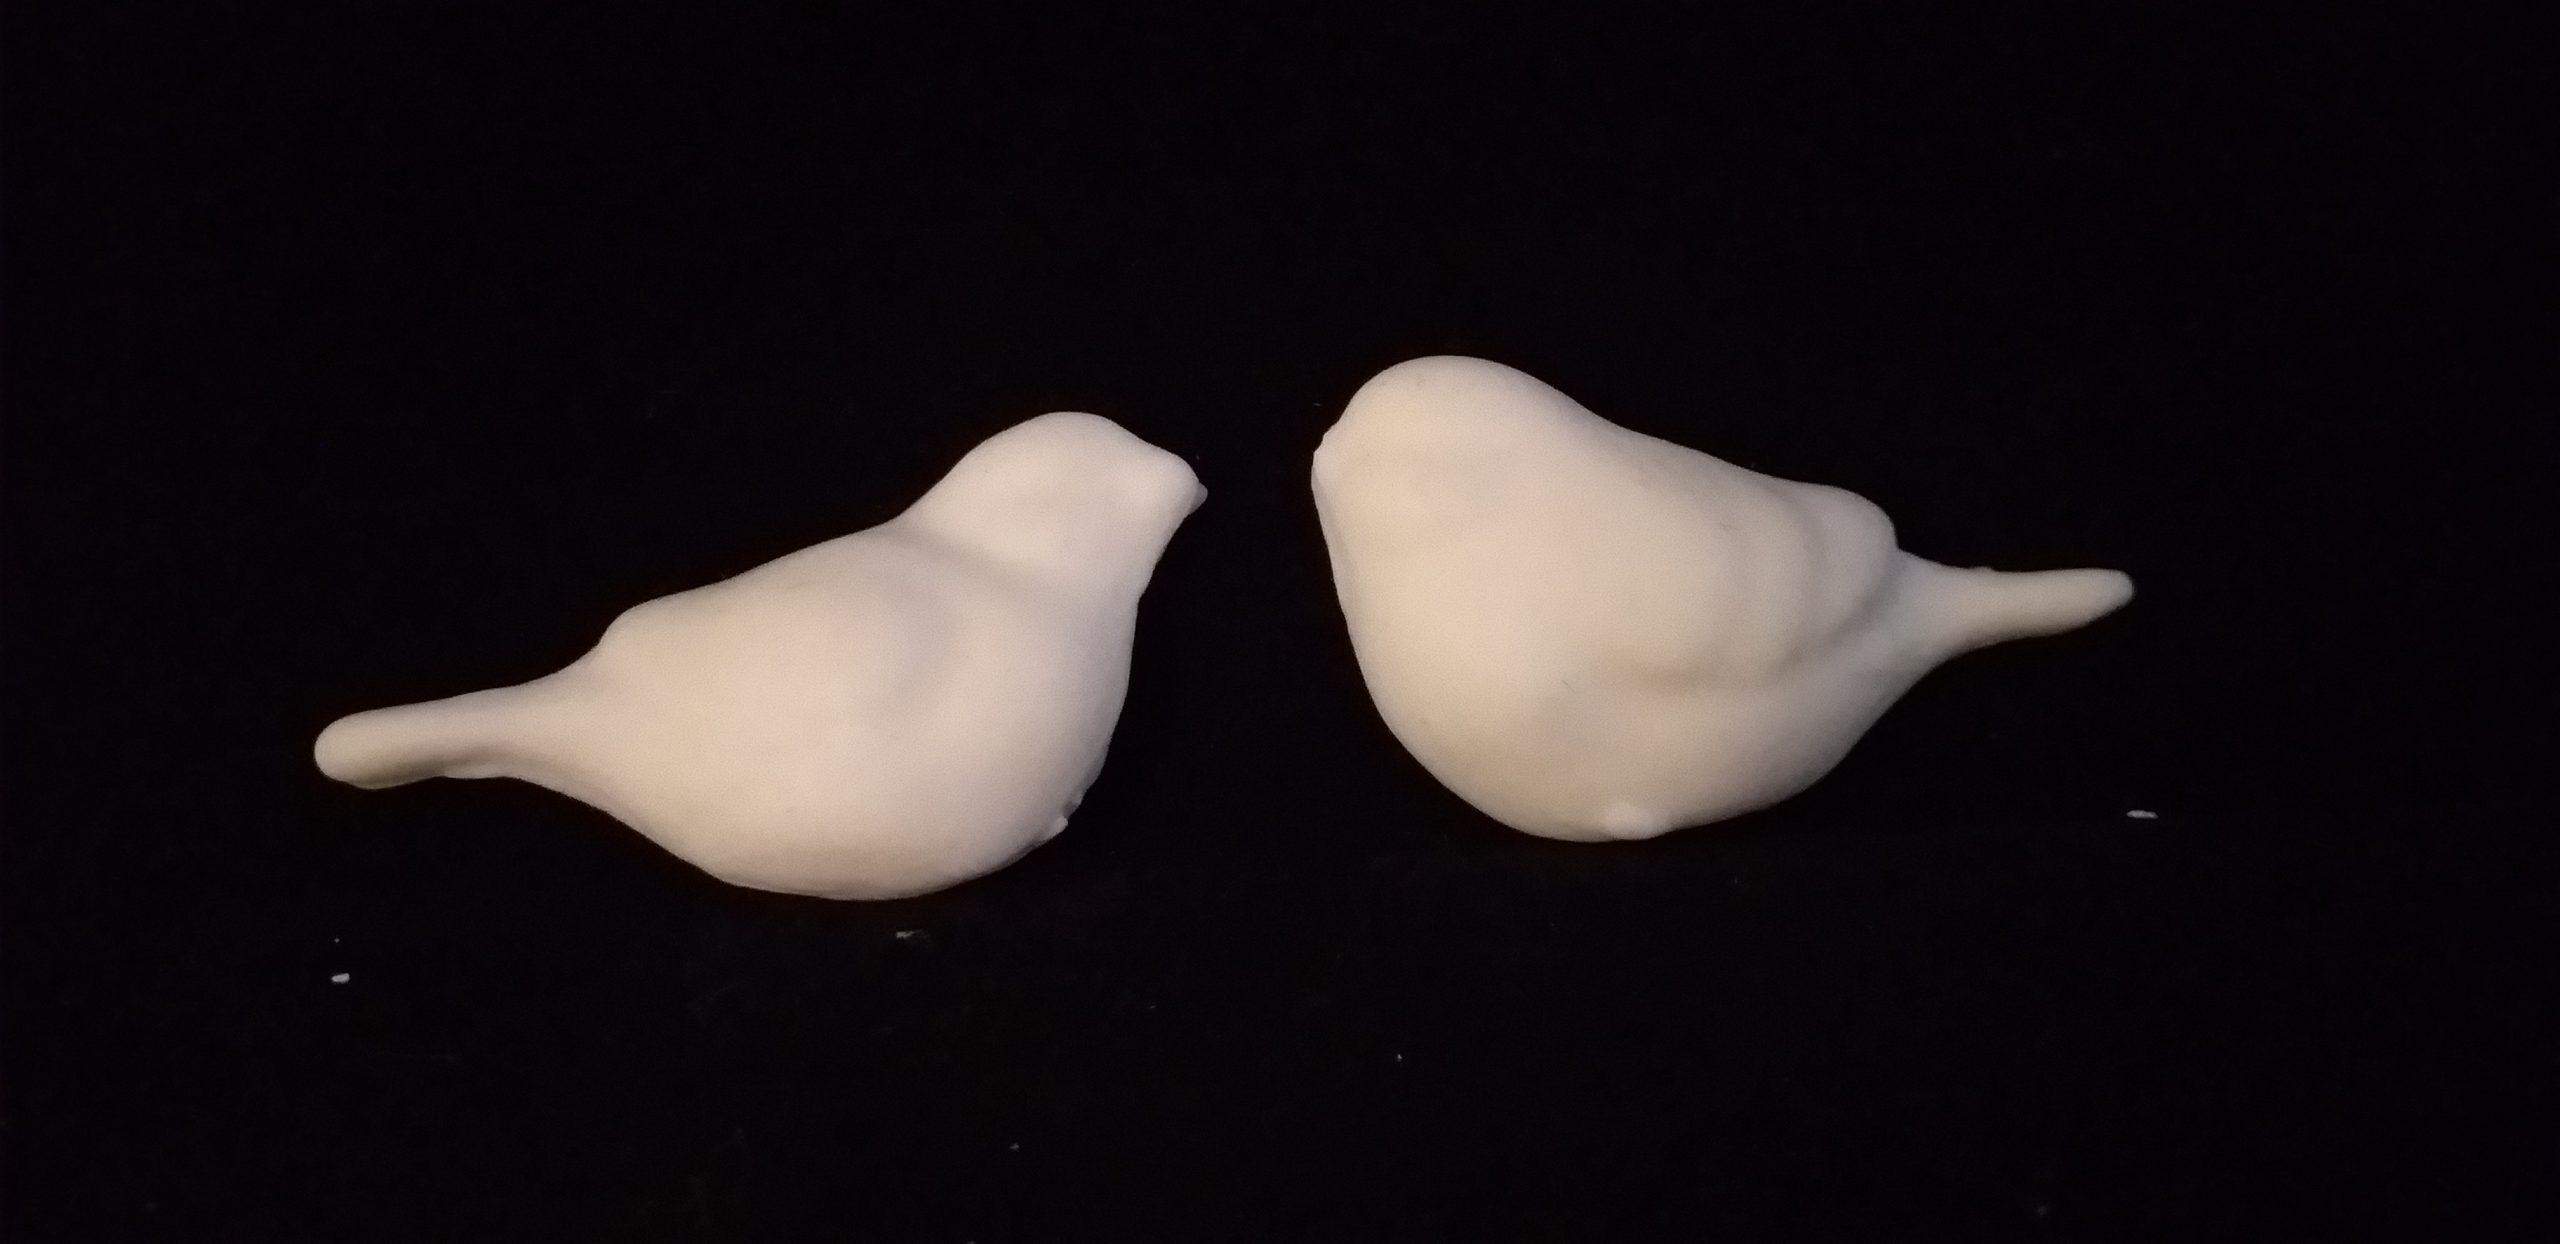 Moldura Pajaritos (par) 17,00 x 8,00 cms. - 1